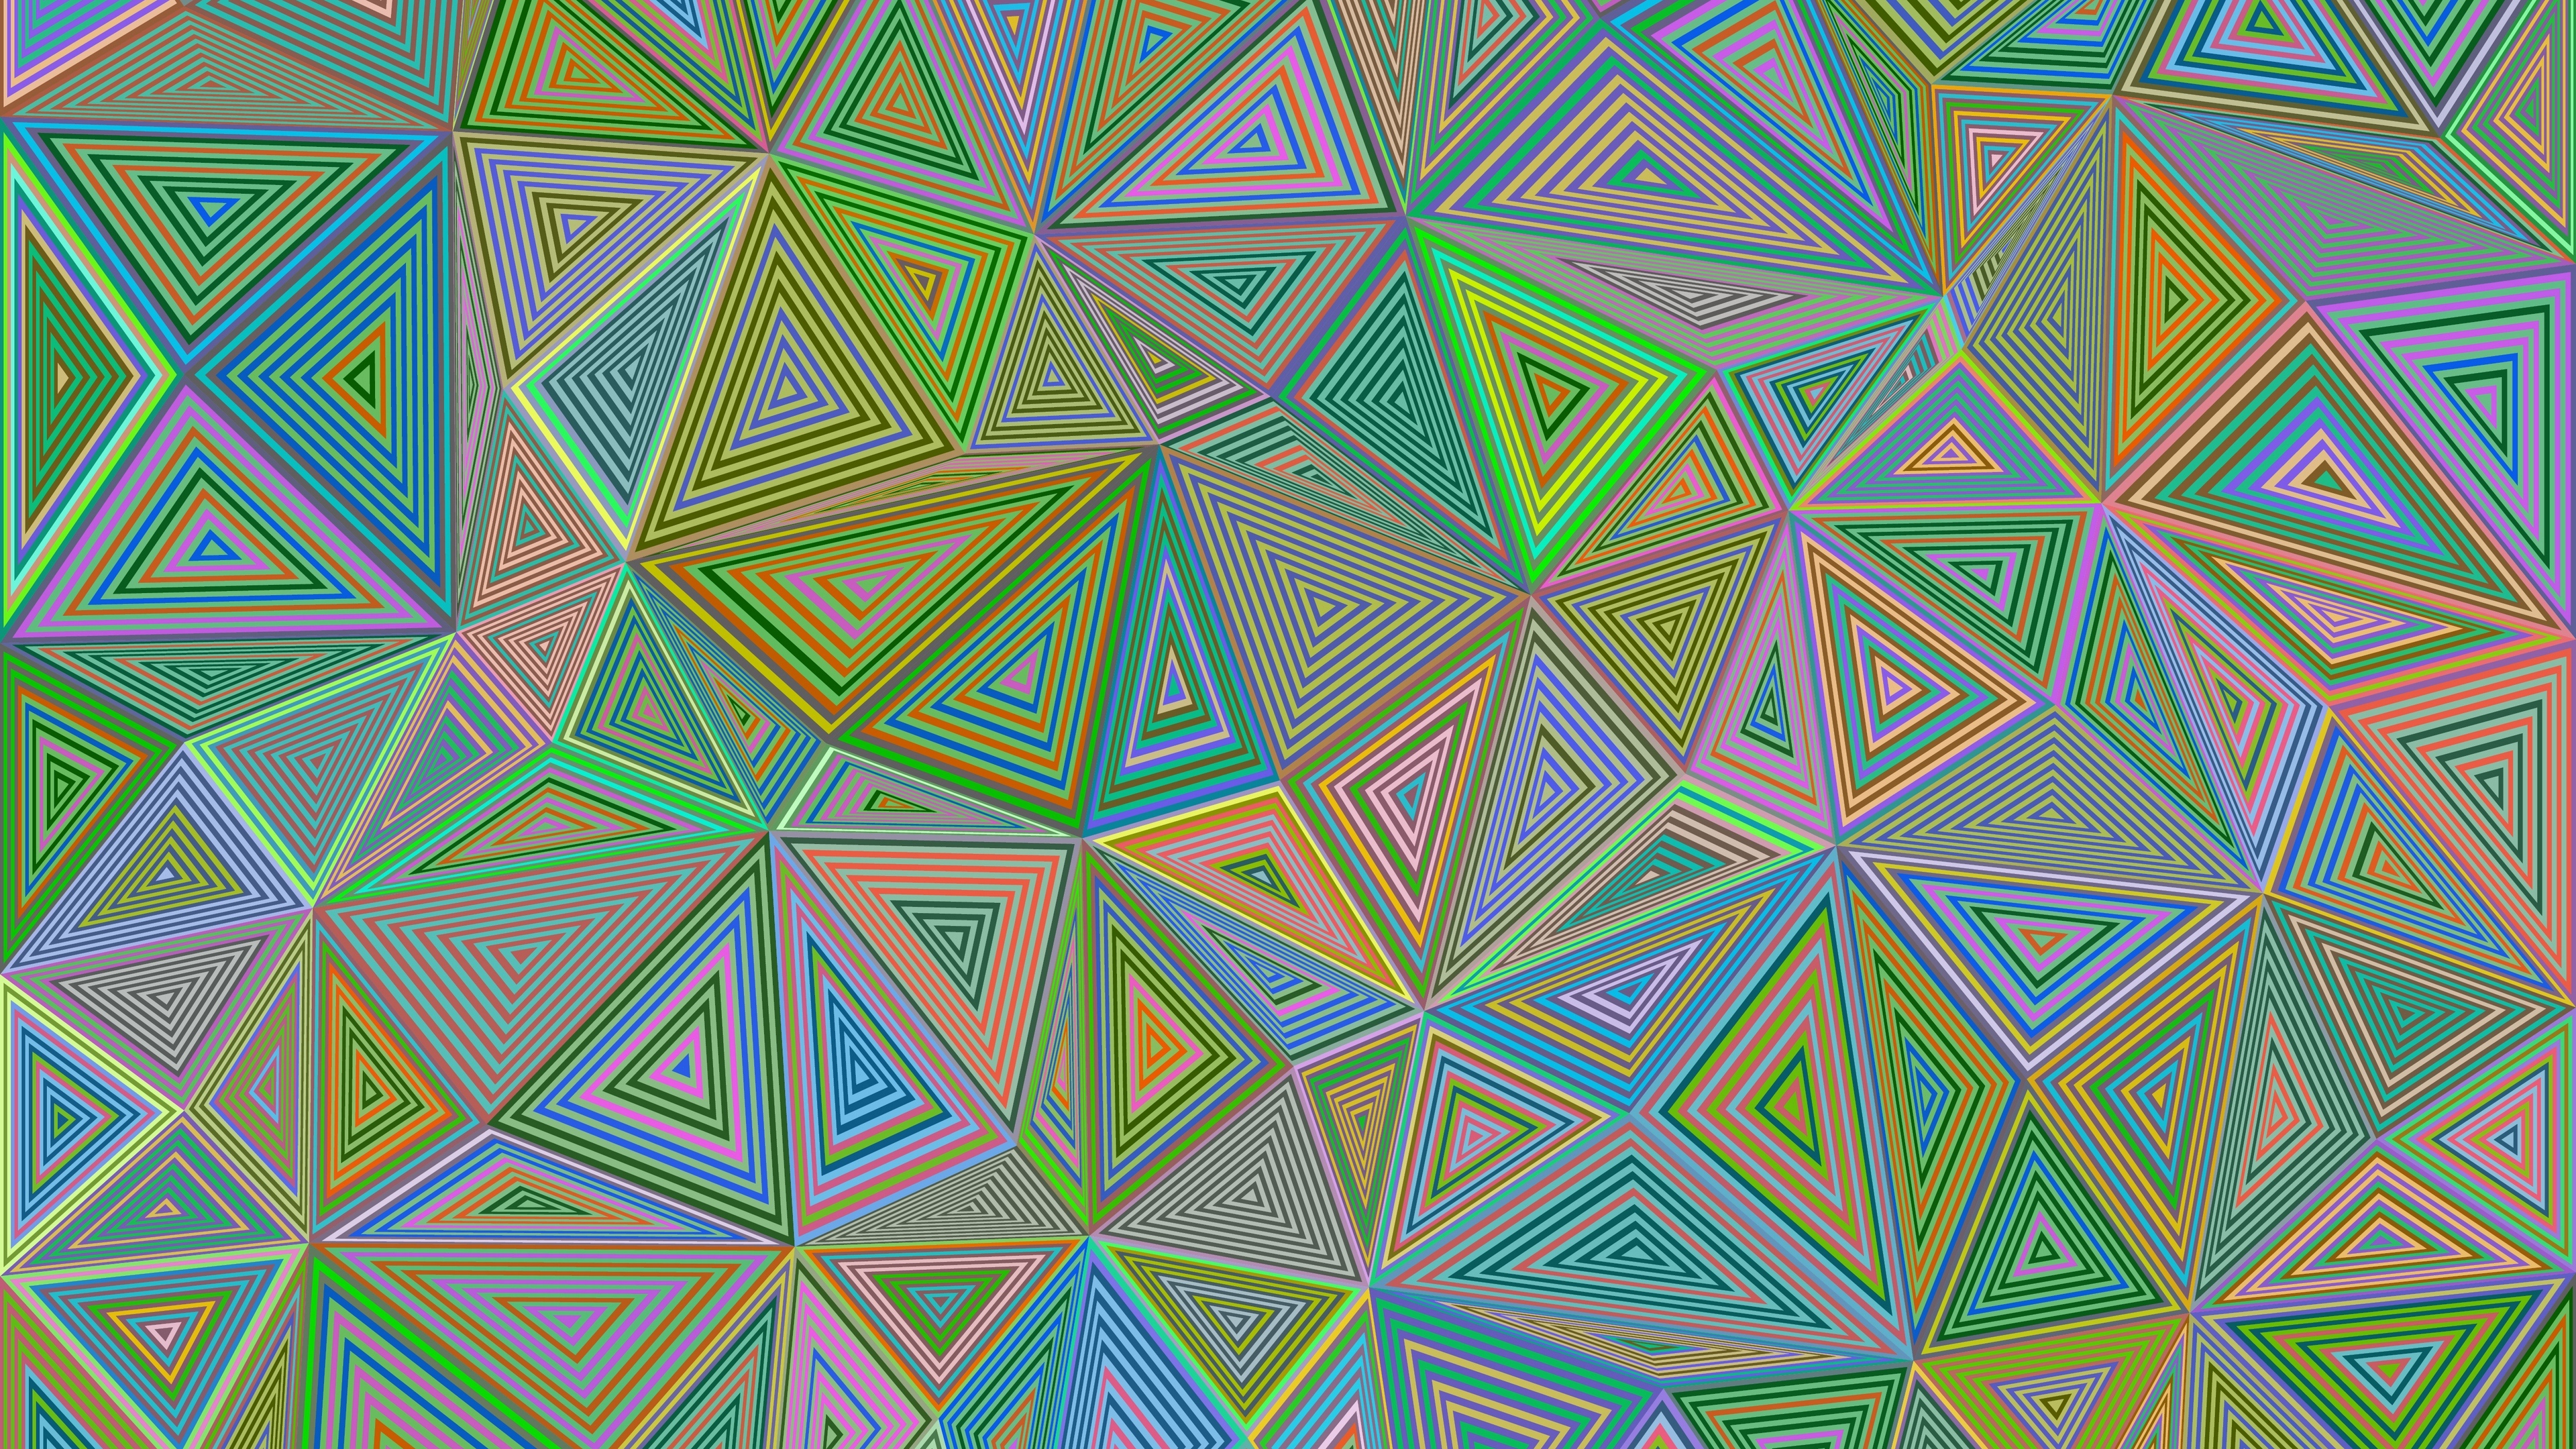 polygon triangle illusion geometric 4k 1536854809 - polygon, triangle, illusion, geometric 4k - Triangle, polygon, Illusion